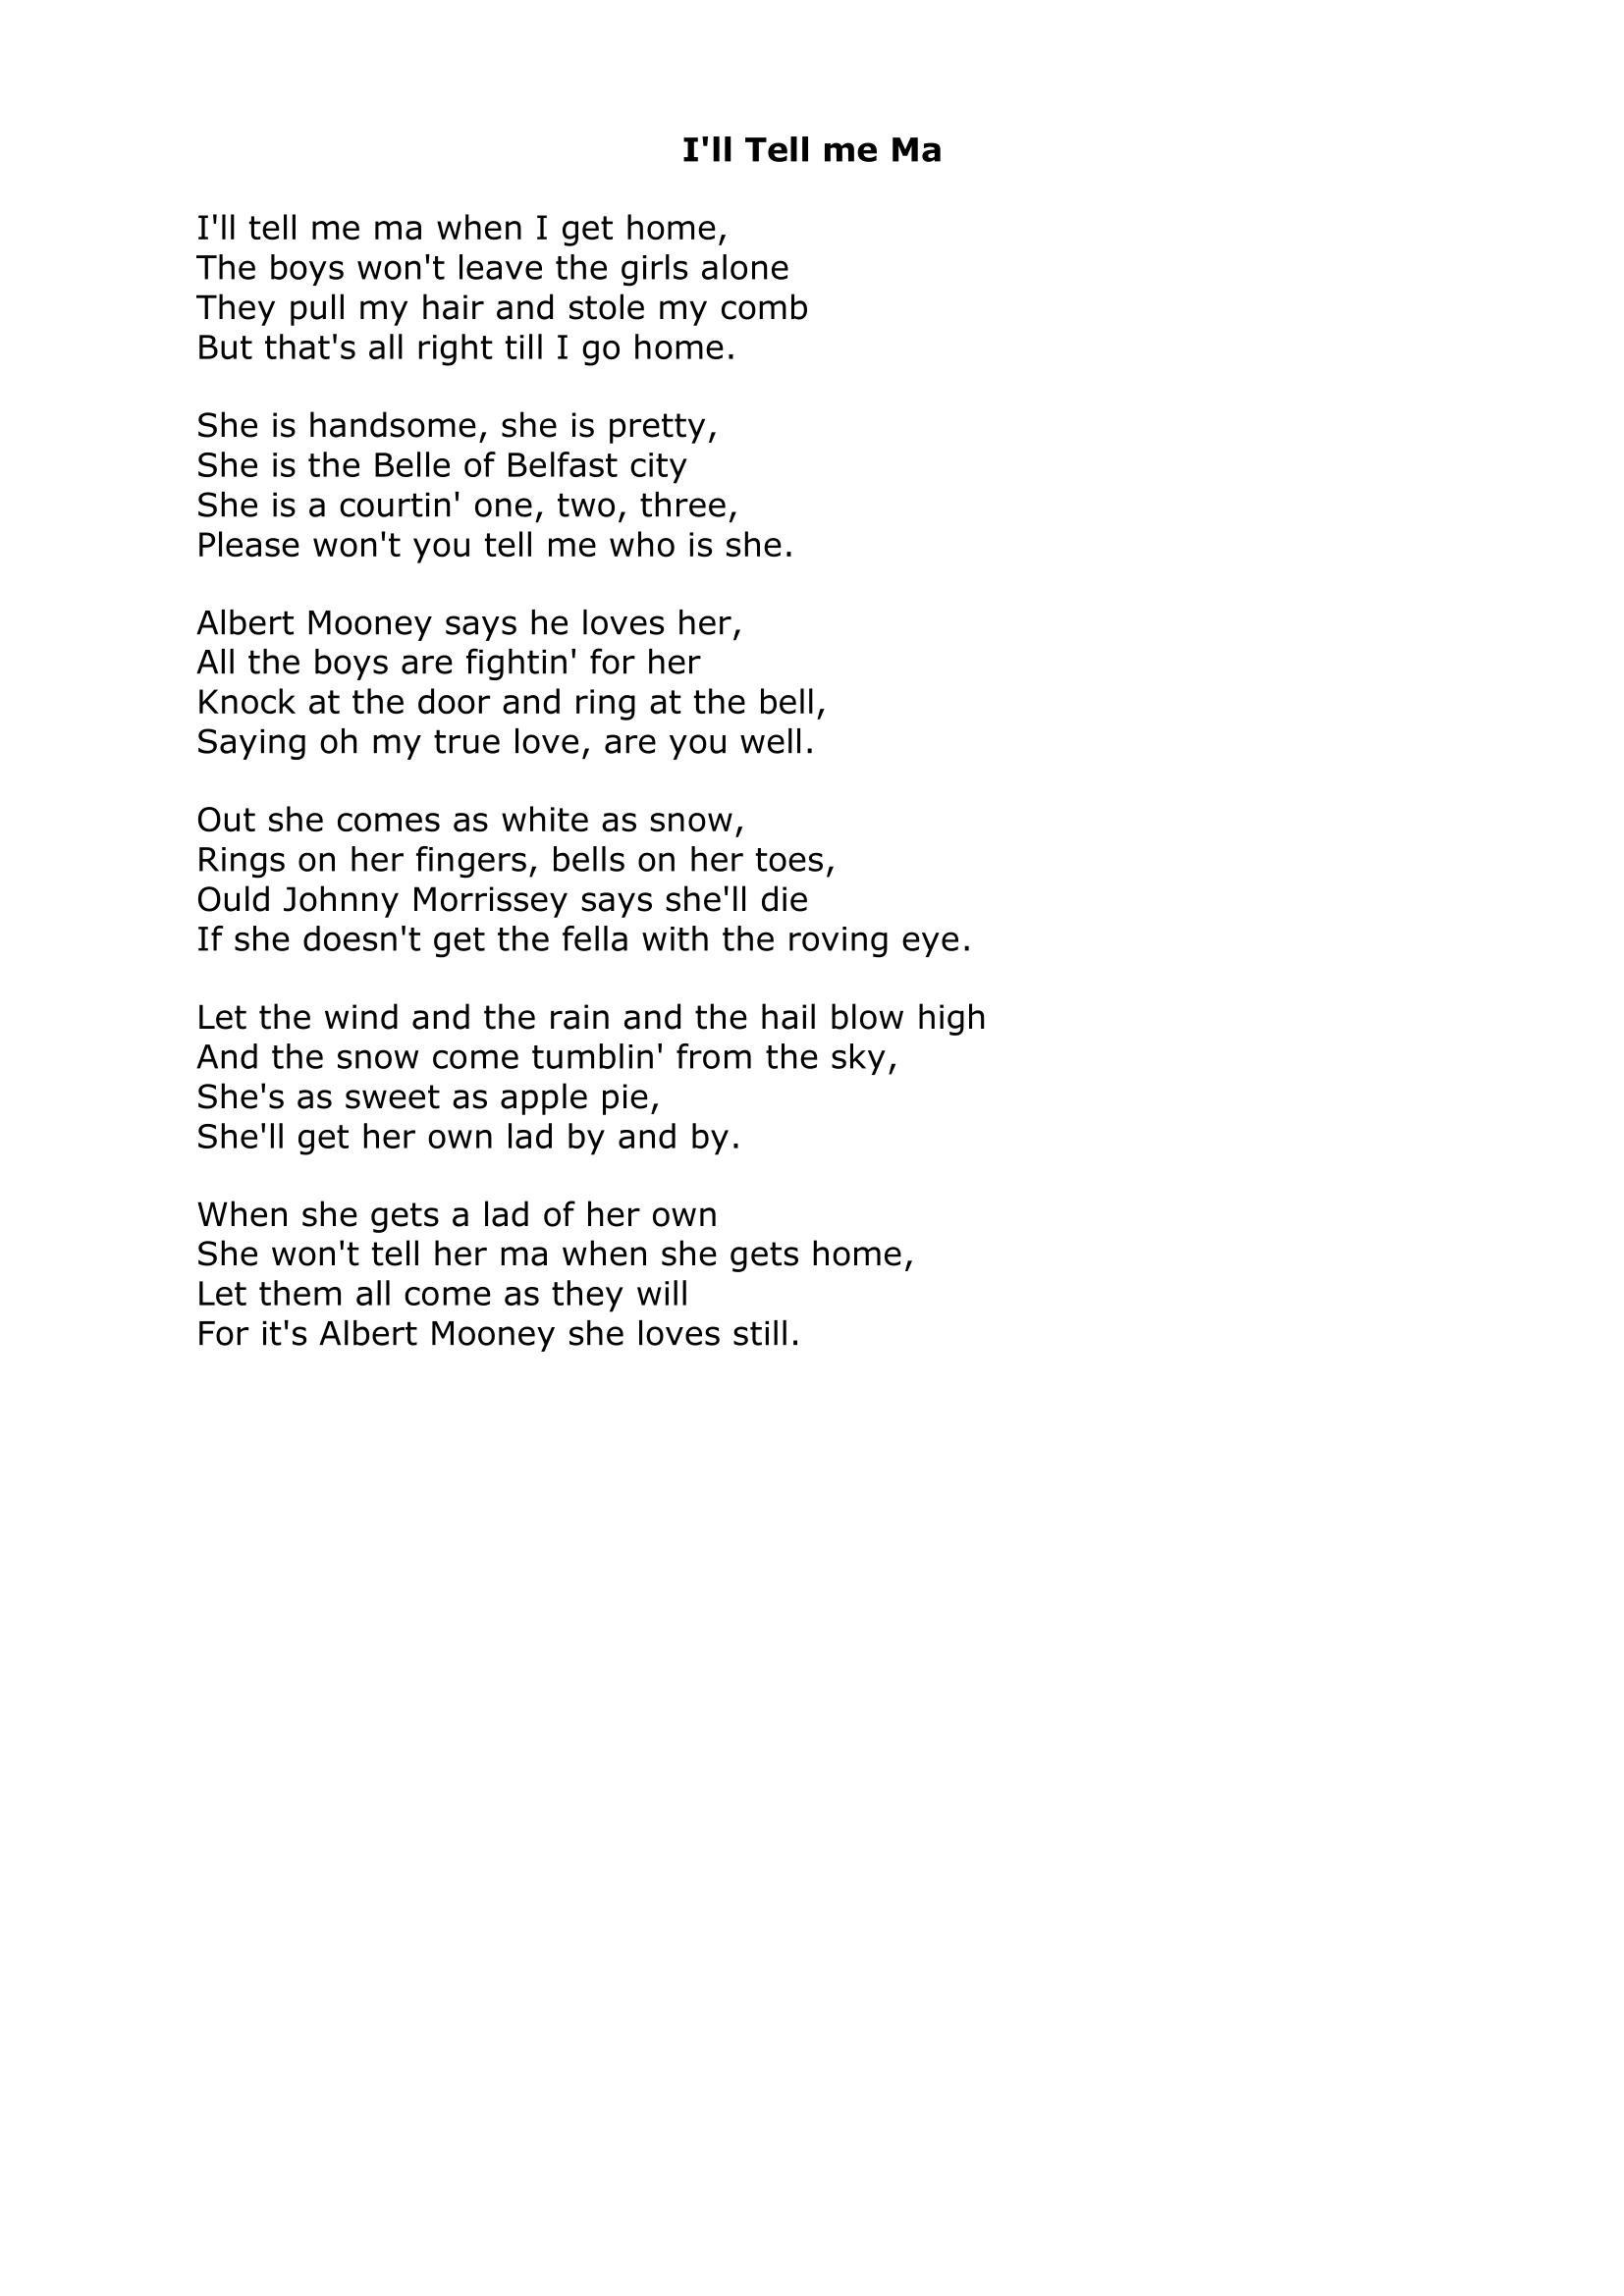 ill-tell-me-ma-lyrics-1